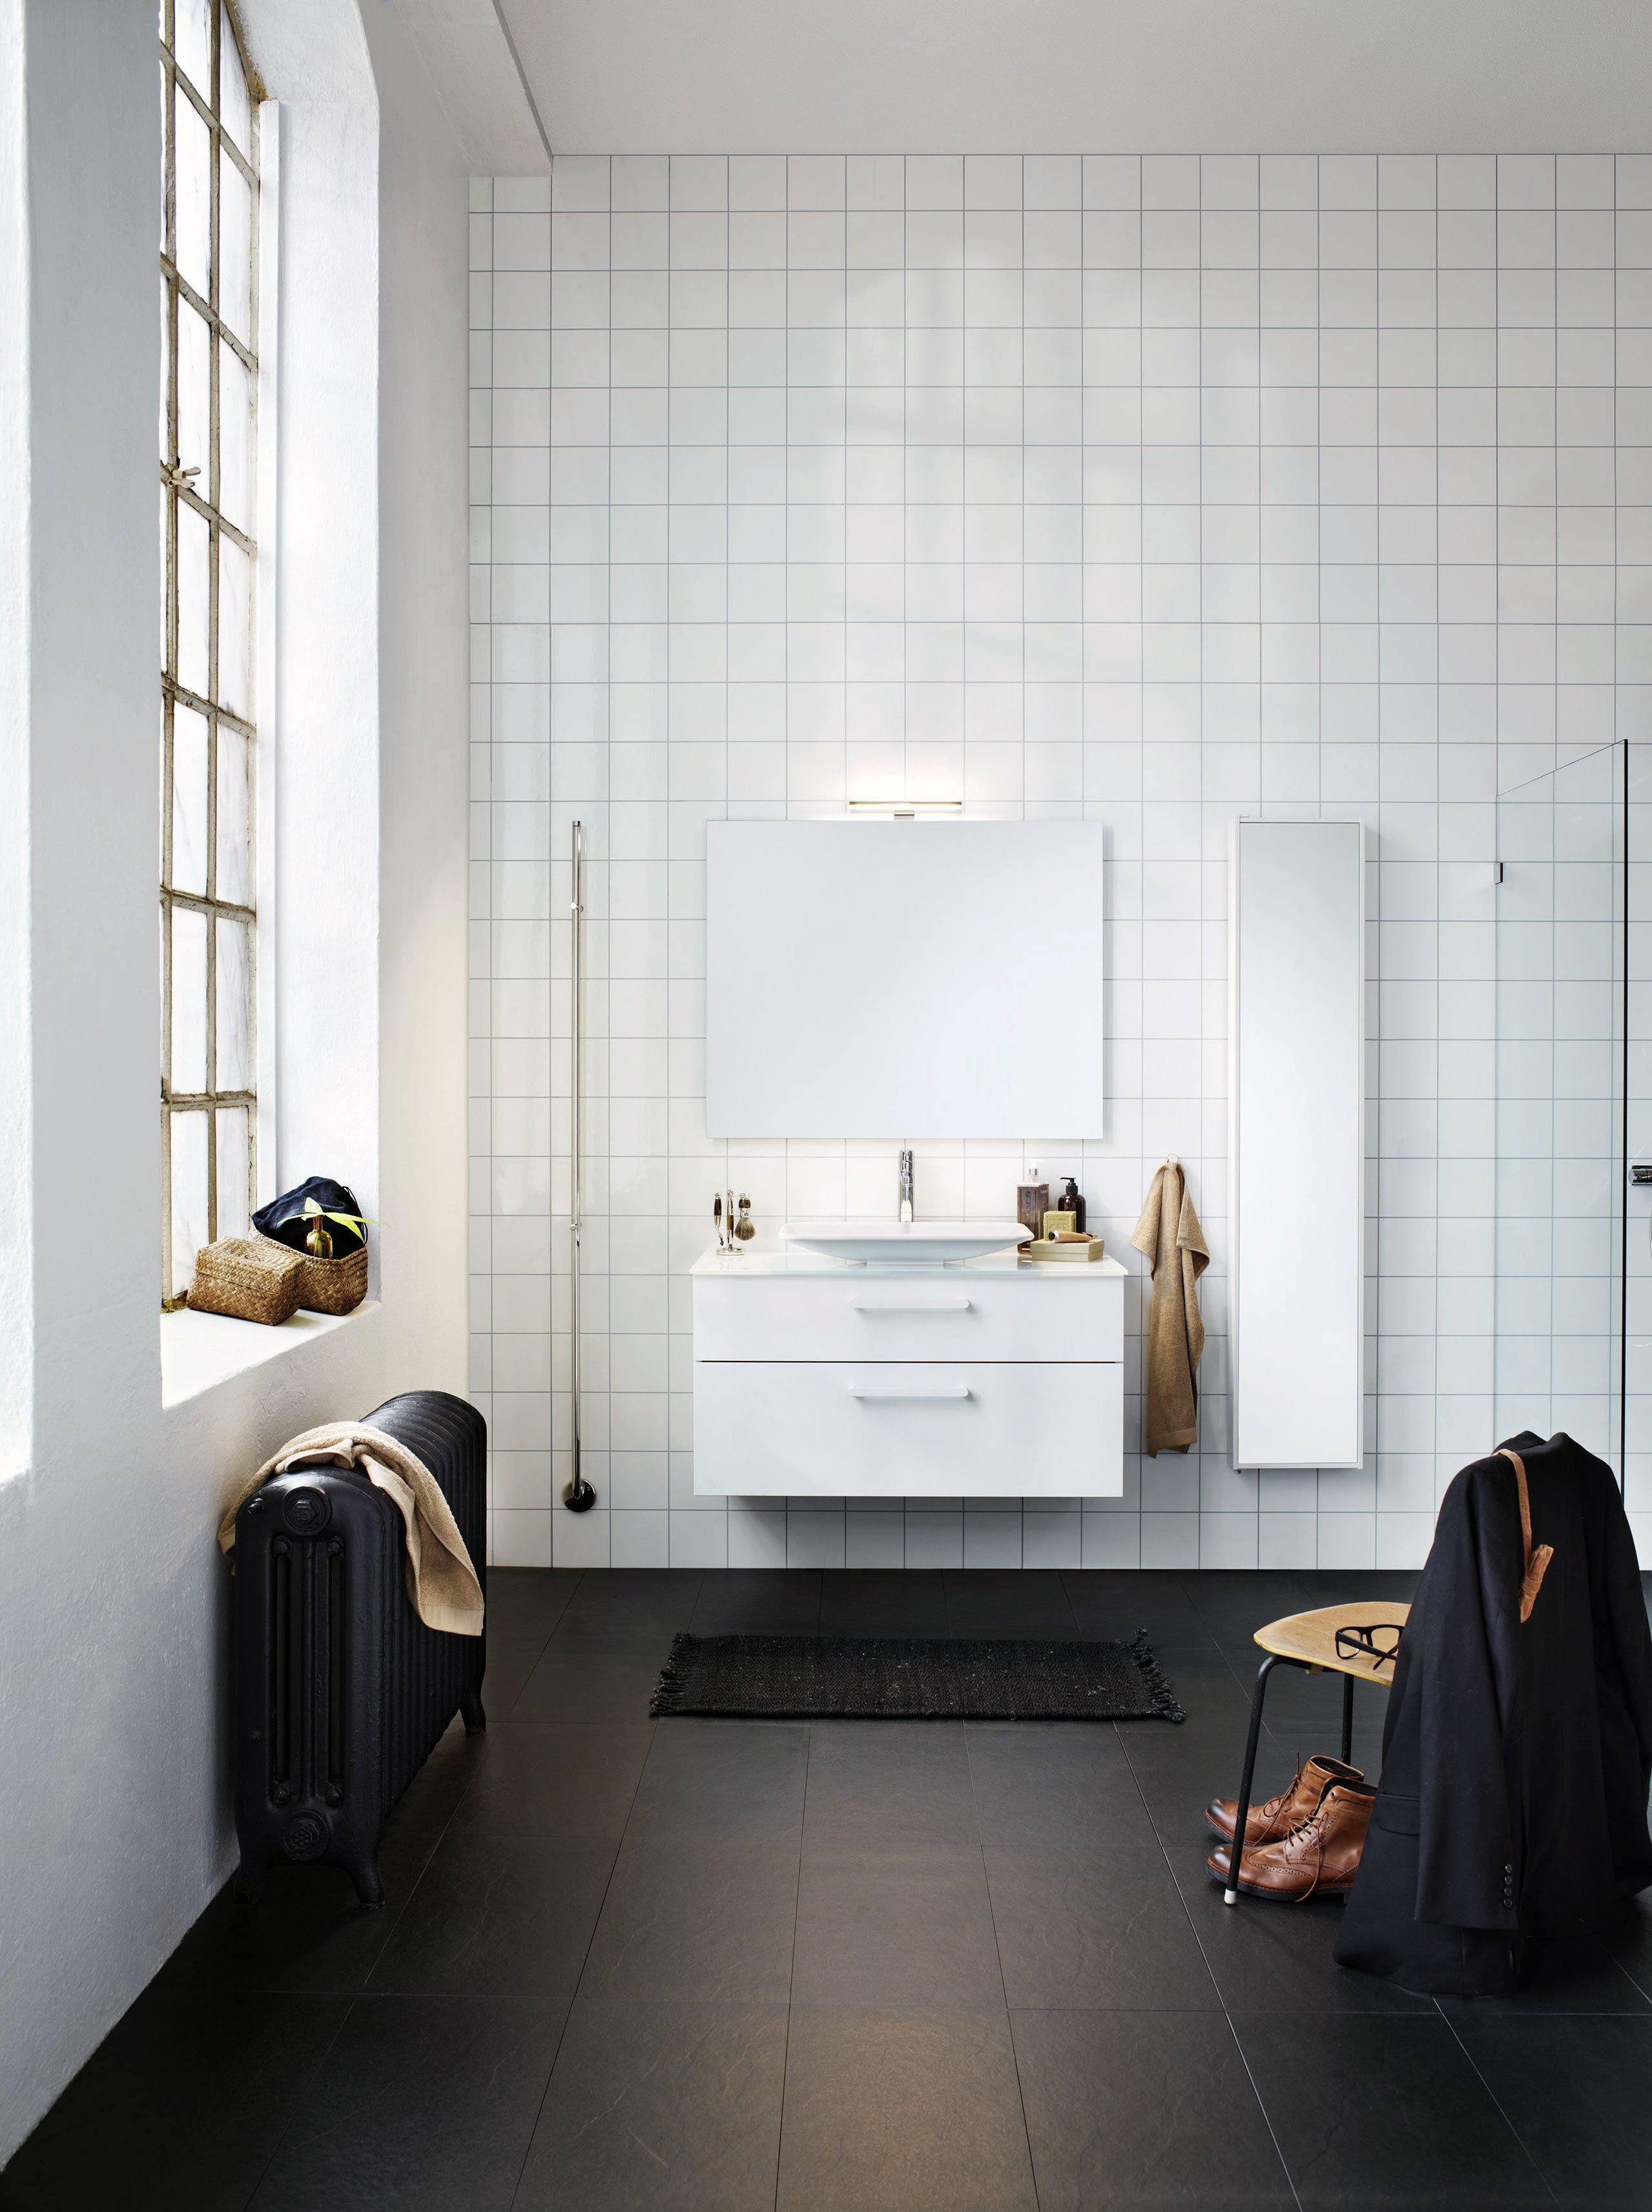 A Scandustrial Concept Sengkang Ea Reno T Blog Chat Resort Bathroom Home Deco Inspired Homes